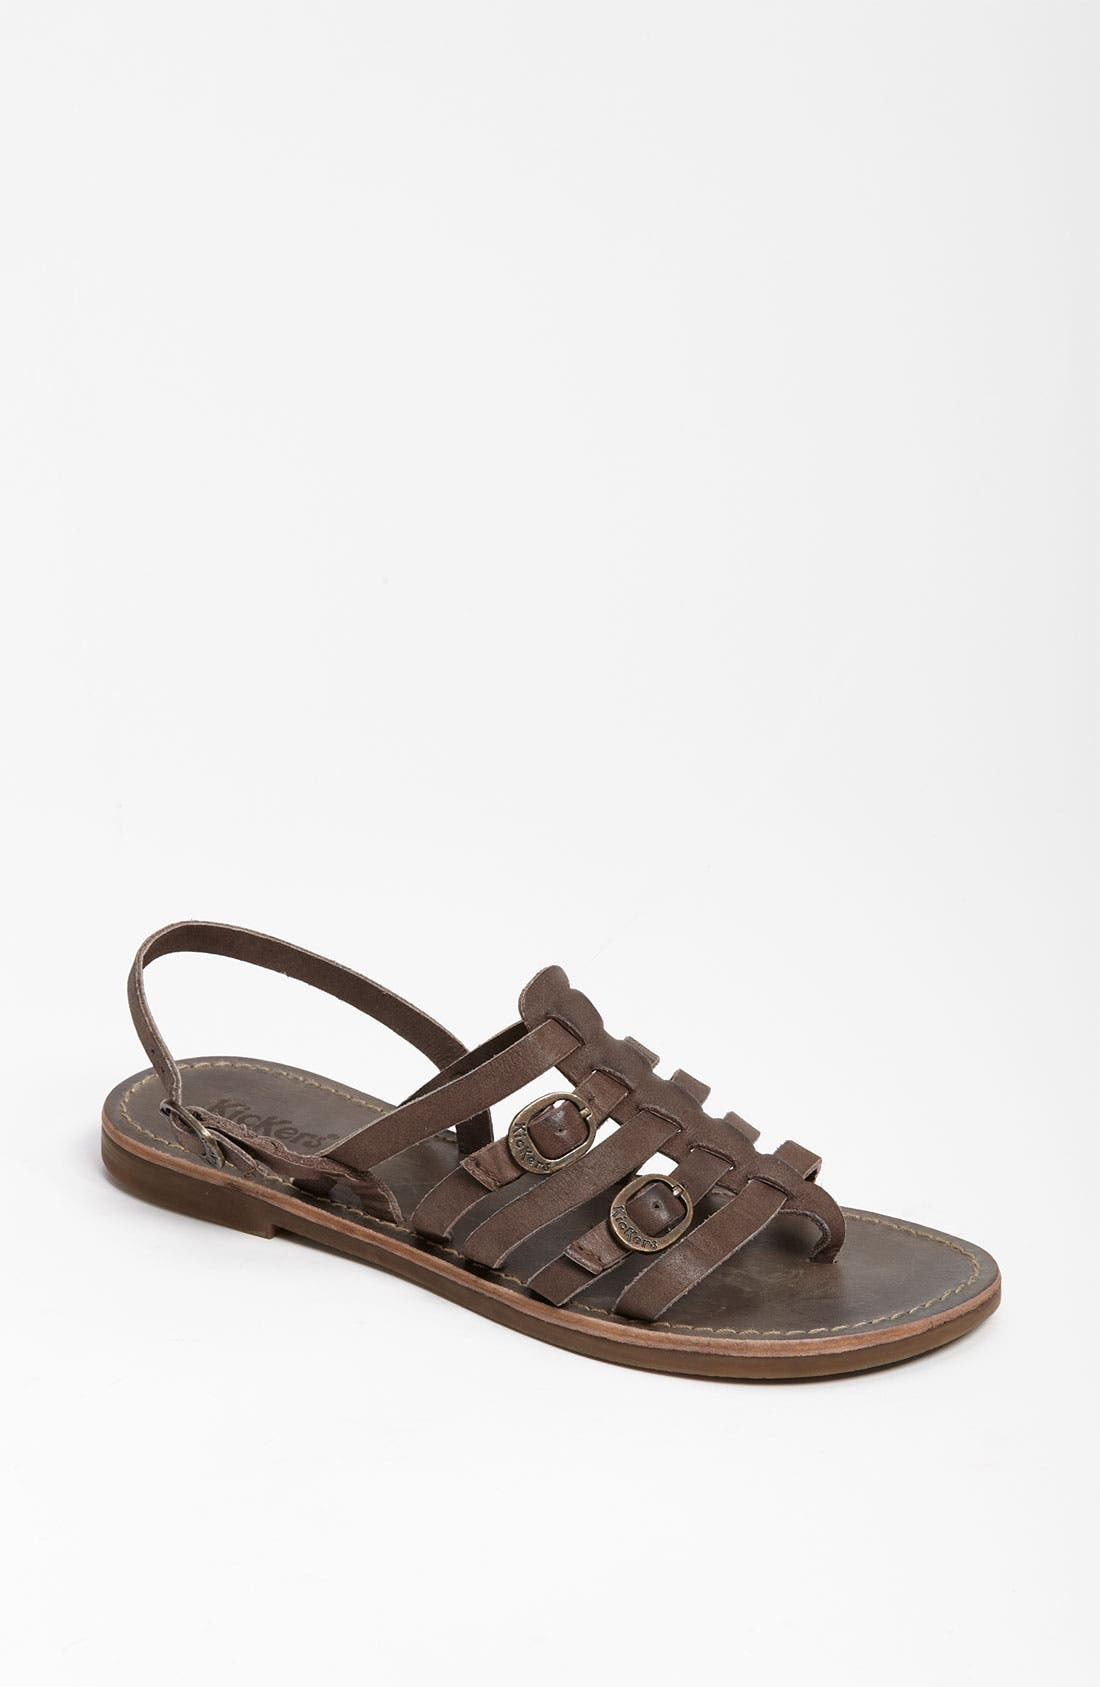 Alternate Image 1 Selected - Kickers 'Dixmille' Sandal